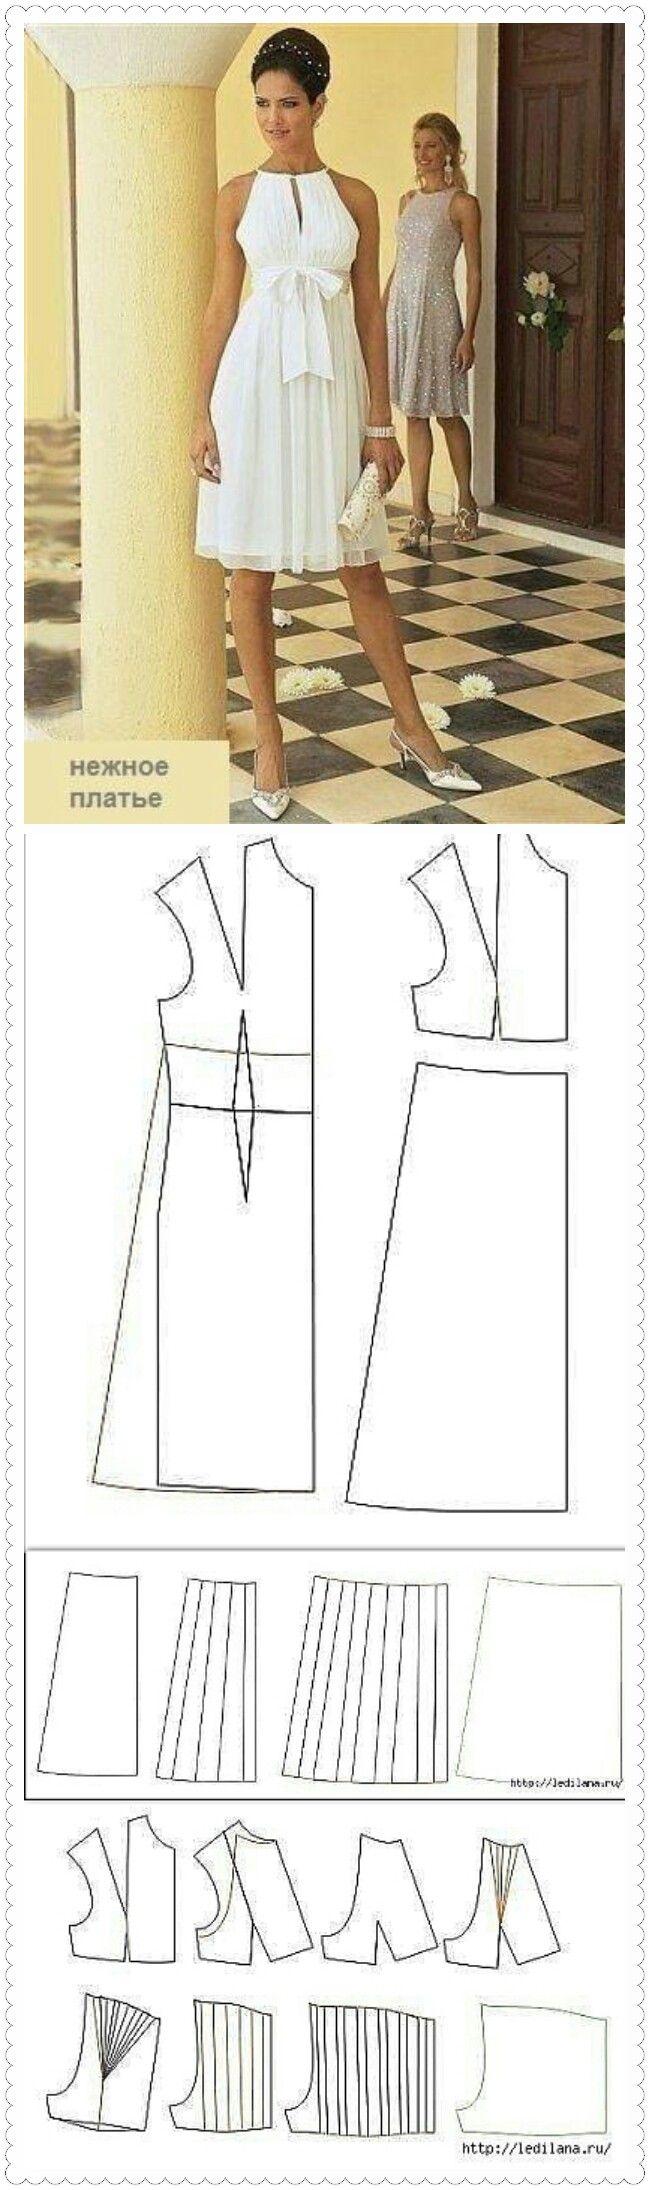 images about vestido para elisa on pinterest lace prom